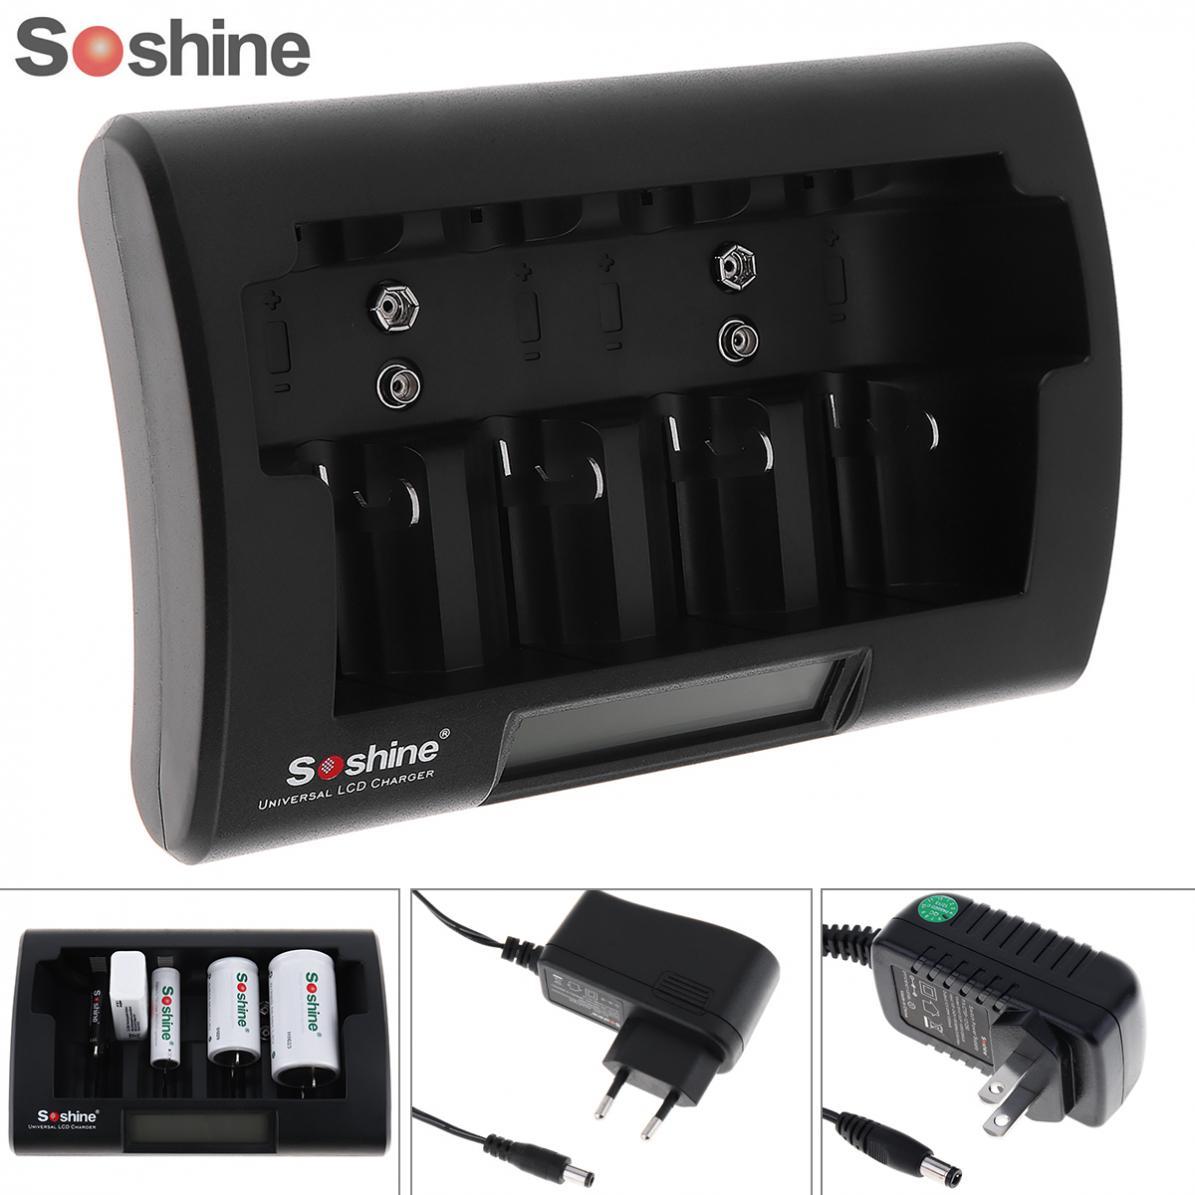 Soshine Universal LCD Display Battery Charger 12-18V DC for Ni-MH / Ni-Cd / AA / AAA / 9V / D Battery with EU / US Plug pkcell fast battery charger for 1 4pcs c lr14 d lr20 aa lr6 aaa lr03 ni mh ni cd and 2pcs 9v rechargeable batteries eu us plug